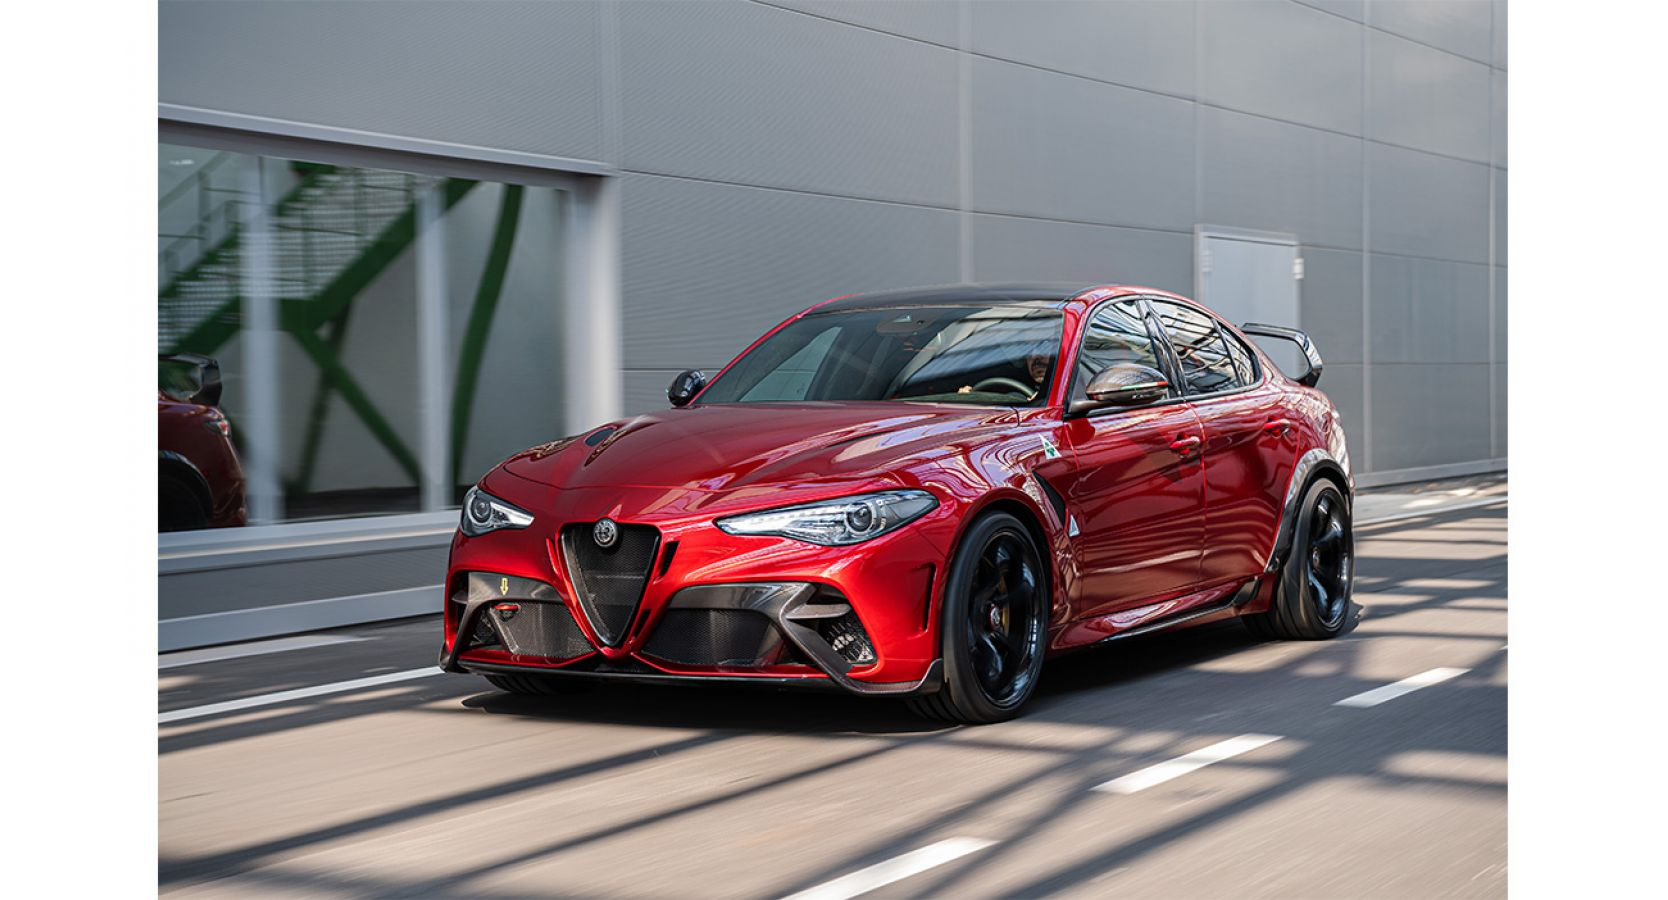 Giulia GTA: Η μεγάλη επιστροφή ενός θρύλου της Alfa Romeo